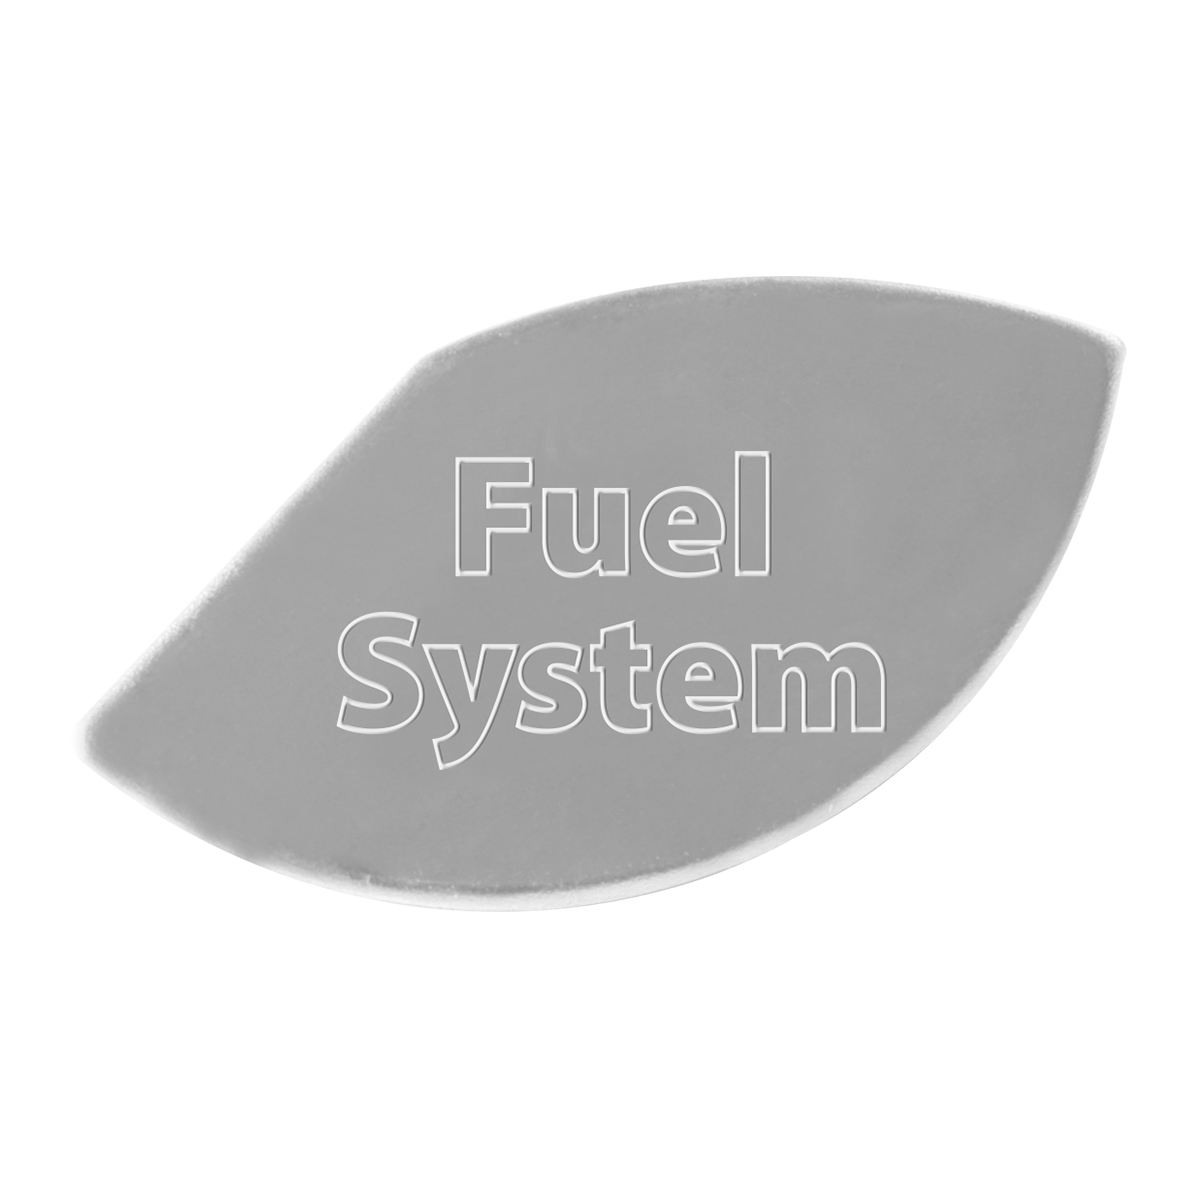 68657 Stainless Steel Fuel System Gauge Emblem for KW